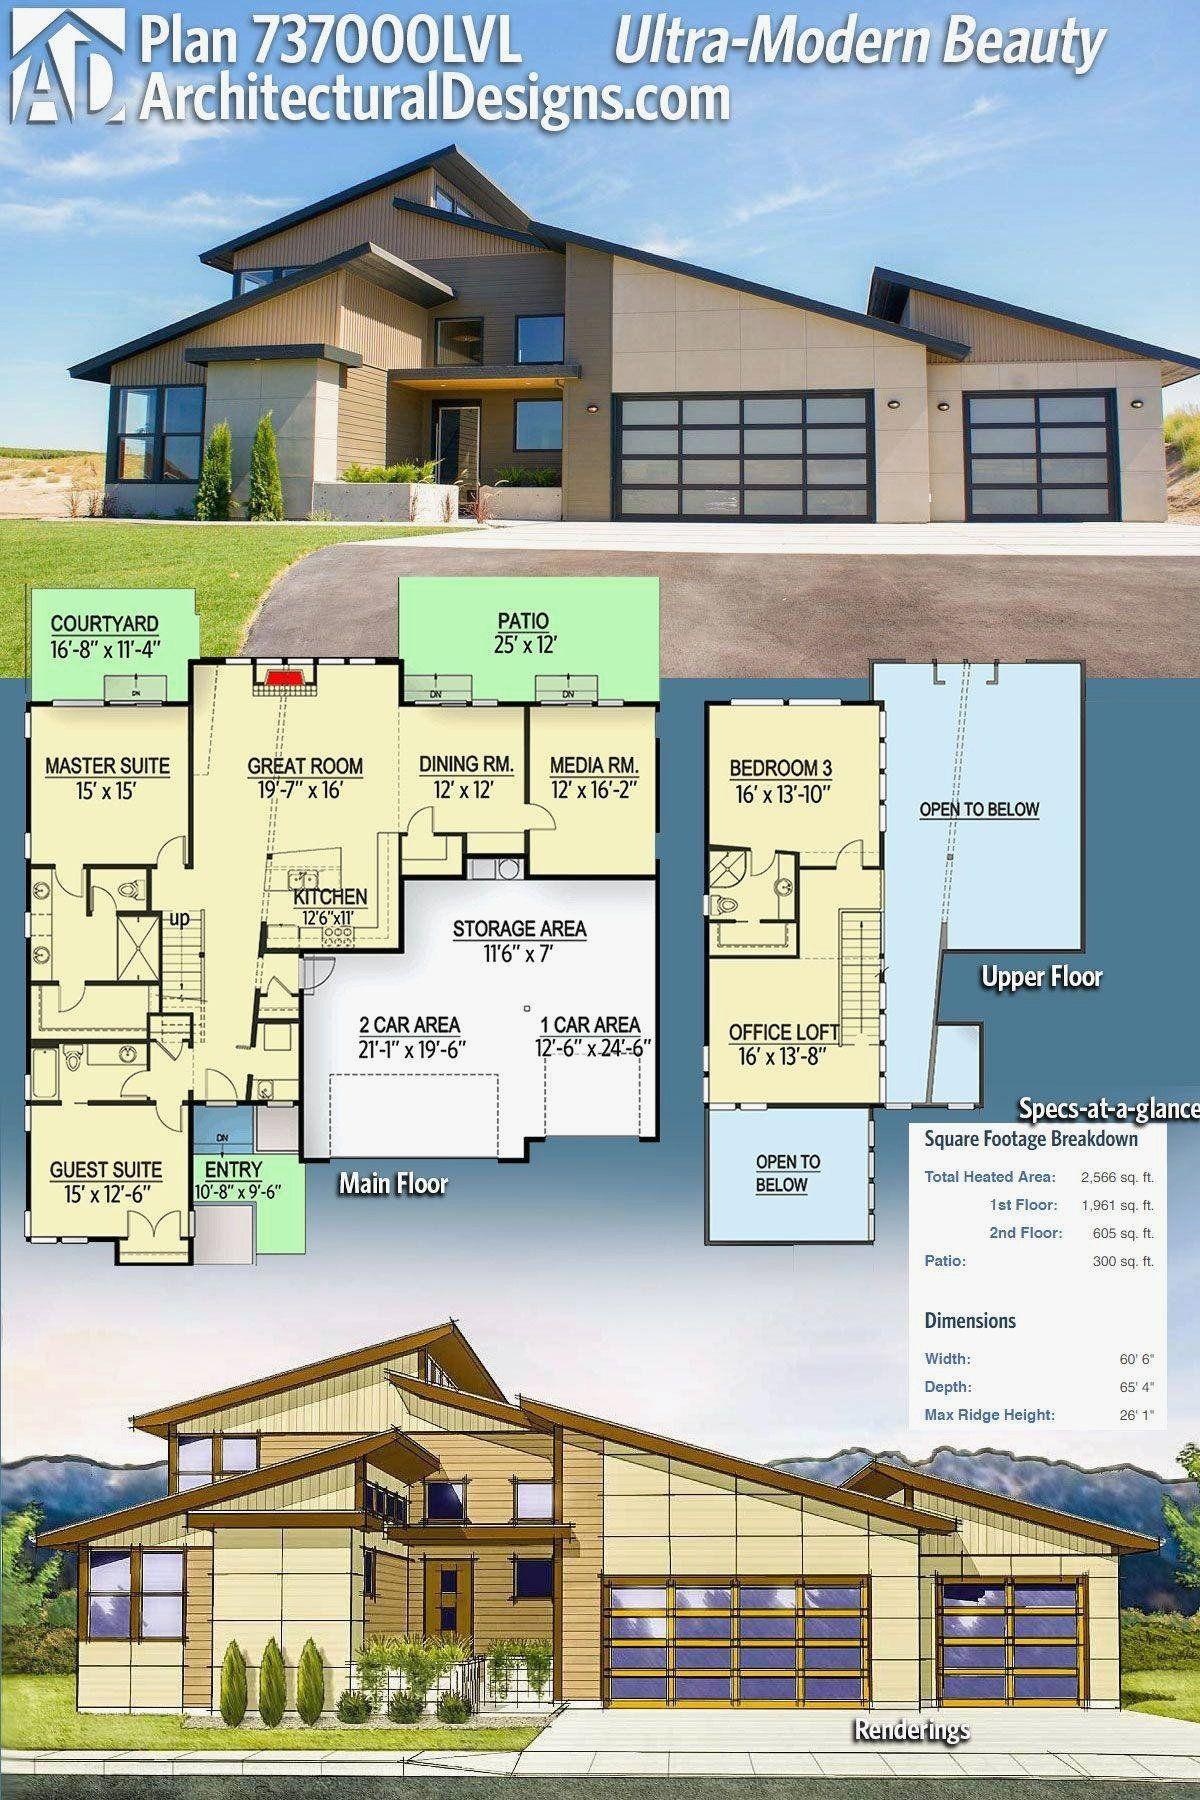 20 Beautiful Modern House Floor Plans Gubugasri Best In 2020 Architectural Design House Plans Contemporary House Plans Modern Floor Plans